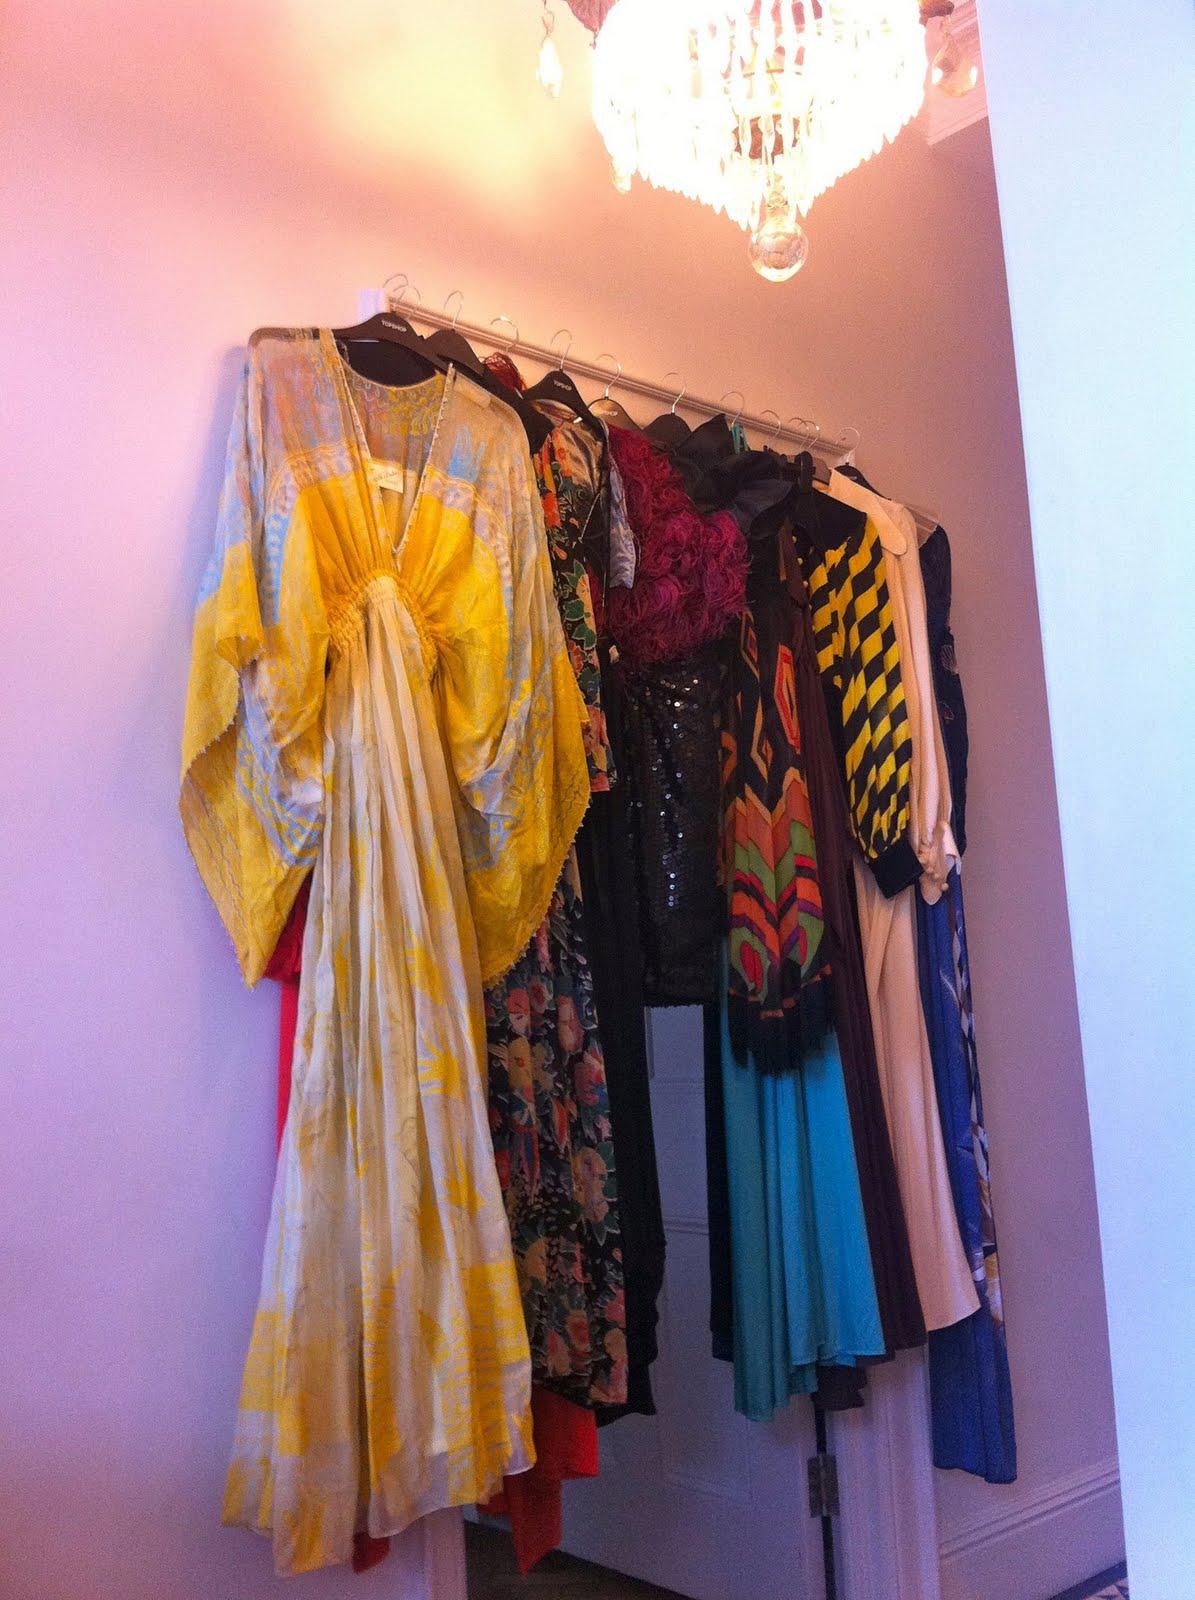 http://3.bp.blogspot.com/-eUtlKpFl8AM/TaHPZEhXXsI/AAAAAAAAAKk/Mcbkoo6nQfw/s1600/Dresses.jpg